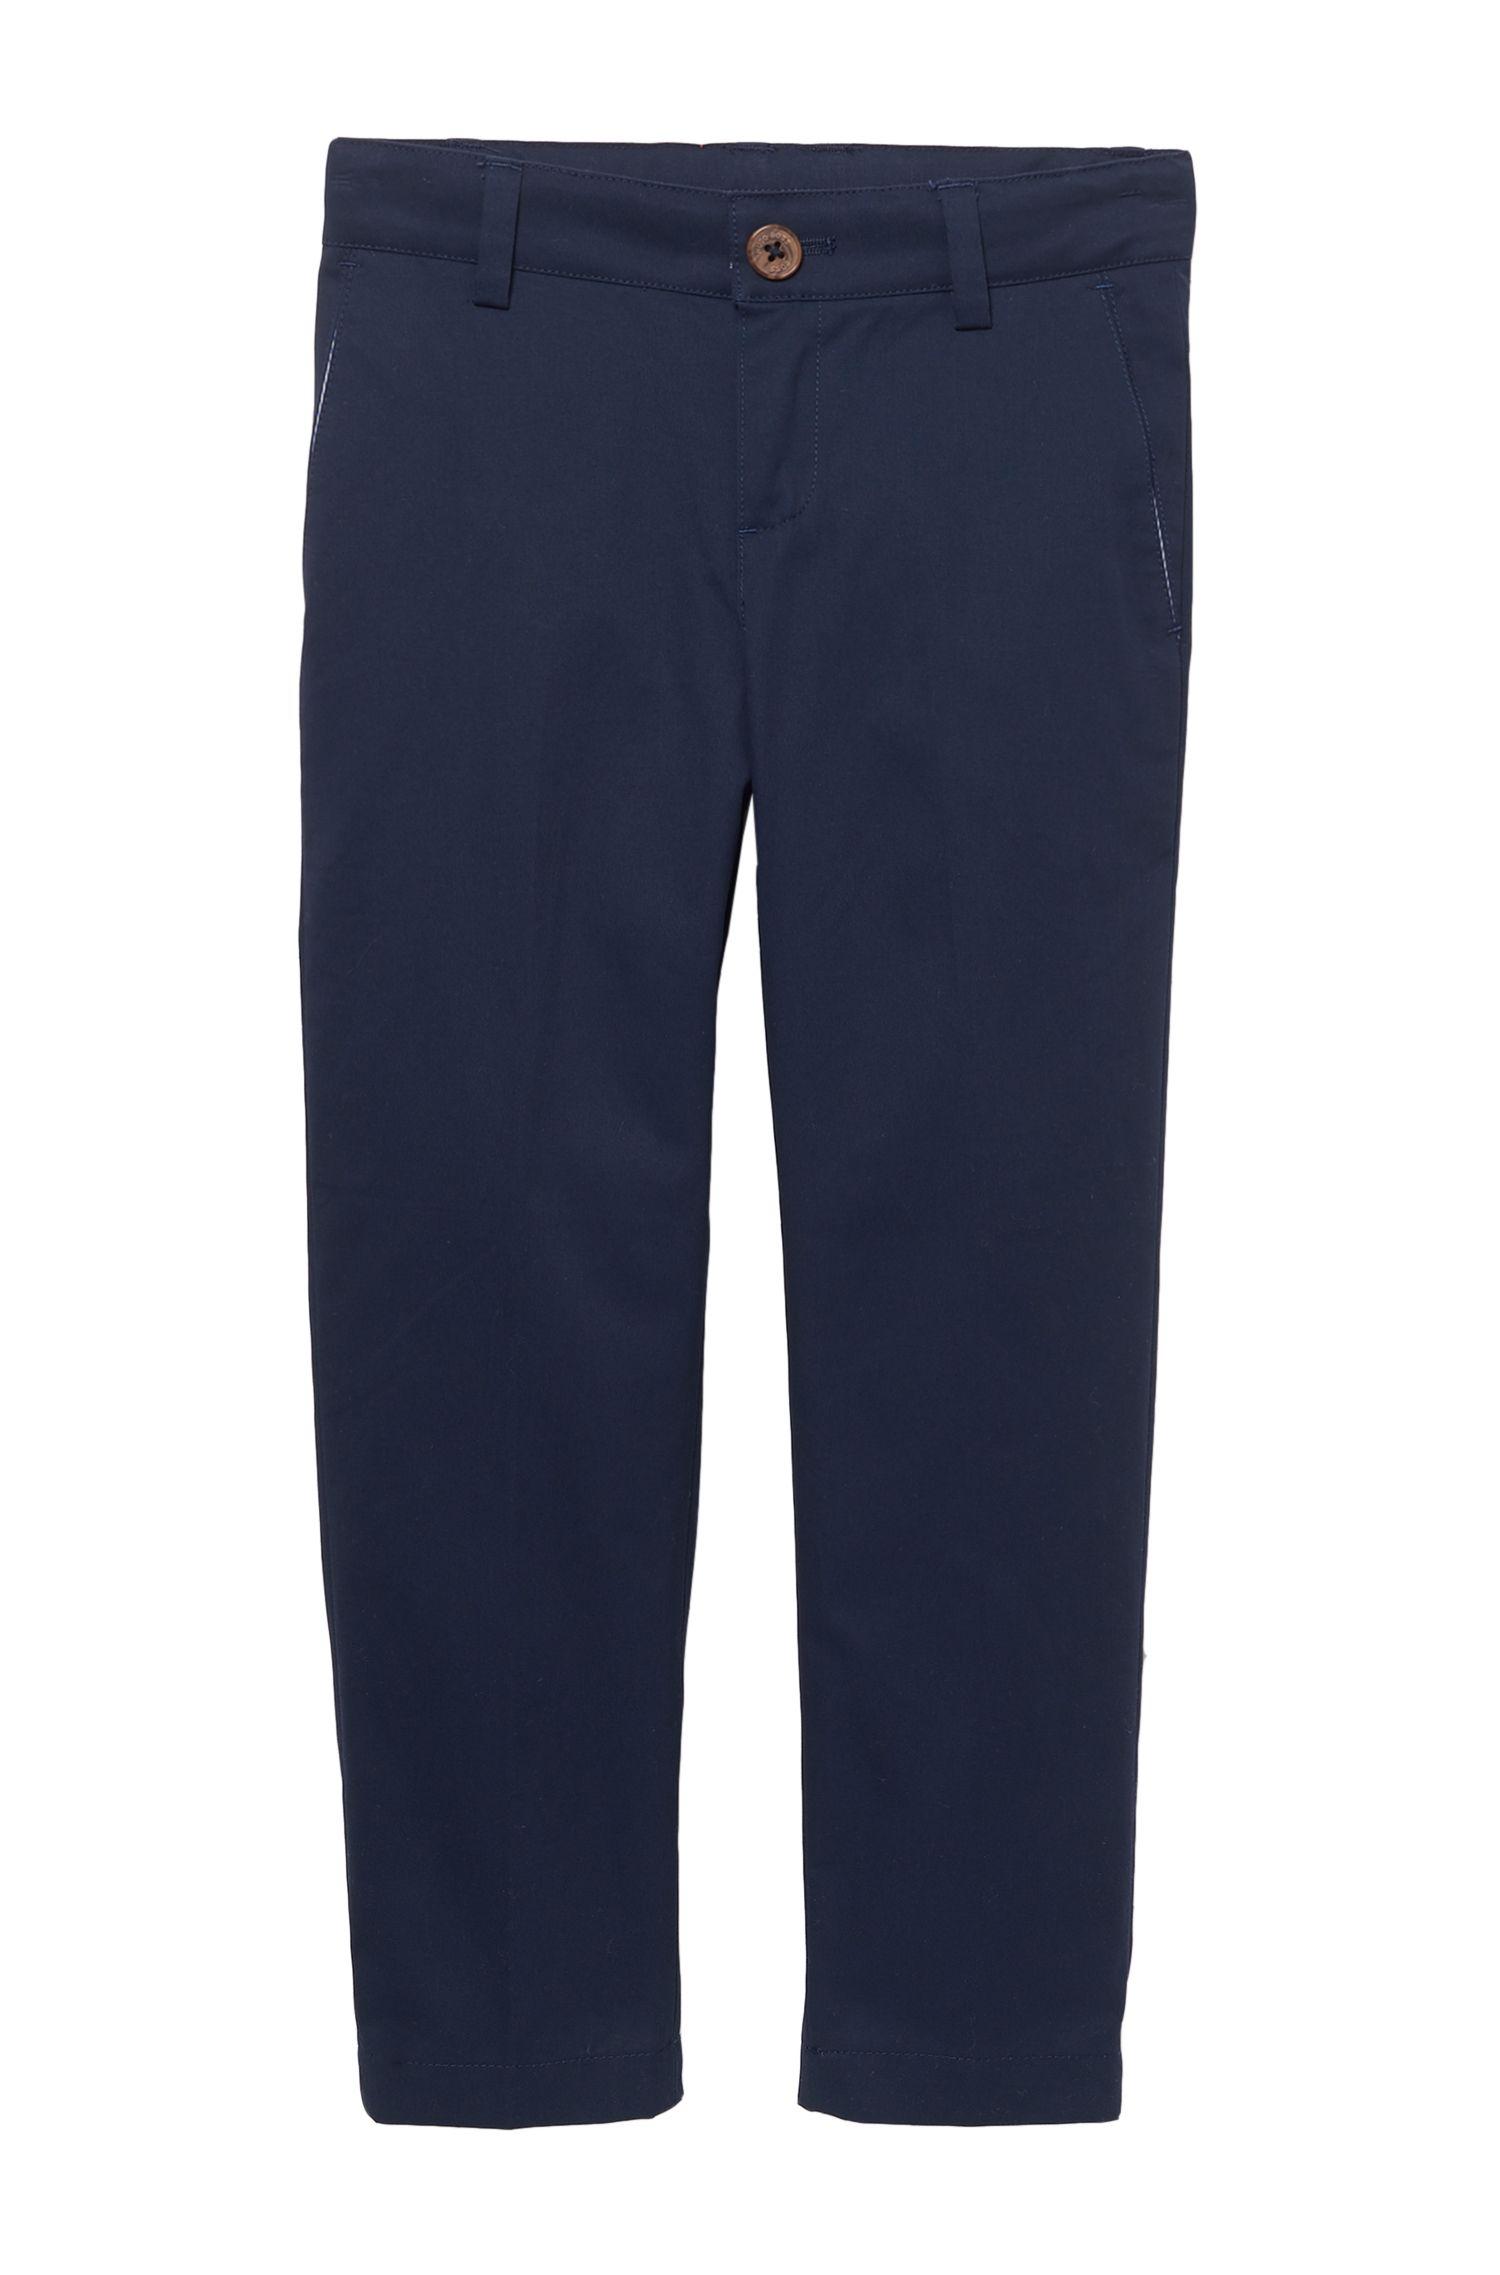 'J24399'   Boys Stretch Cotton Trousers